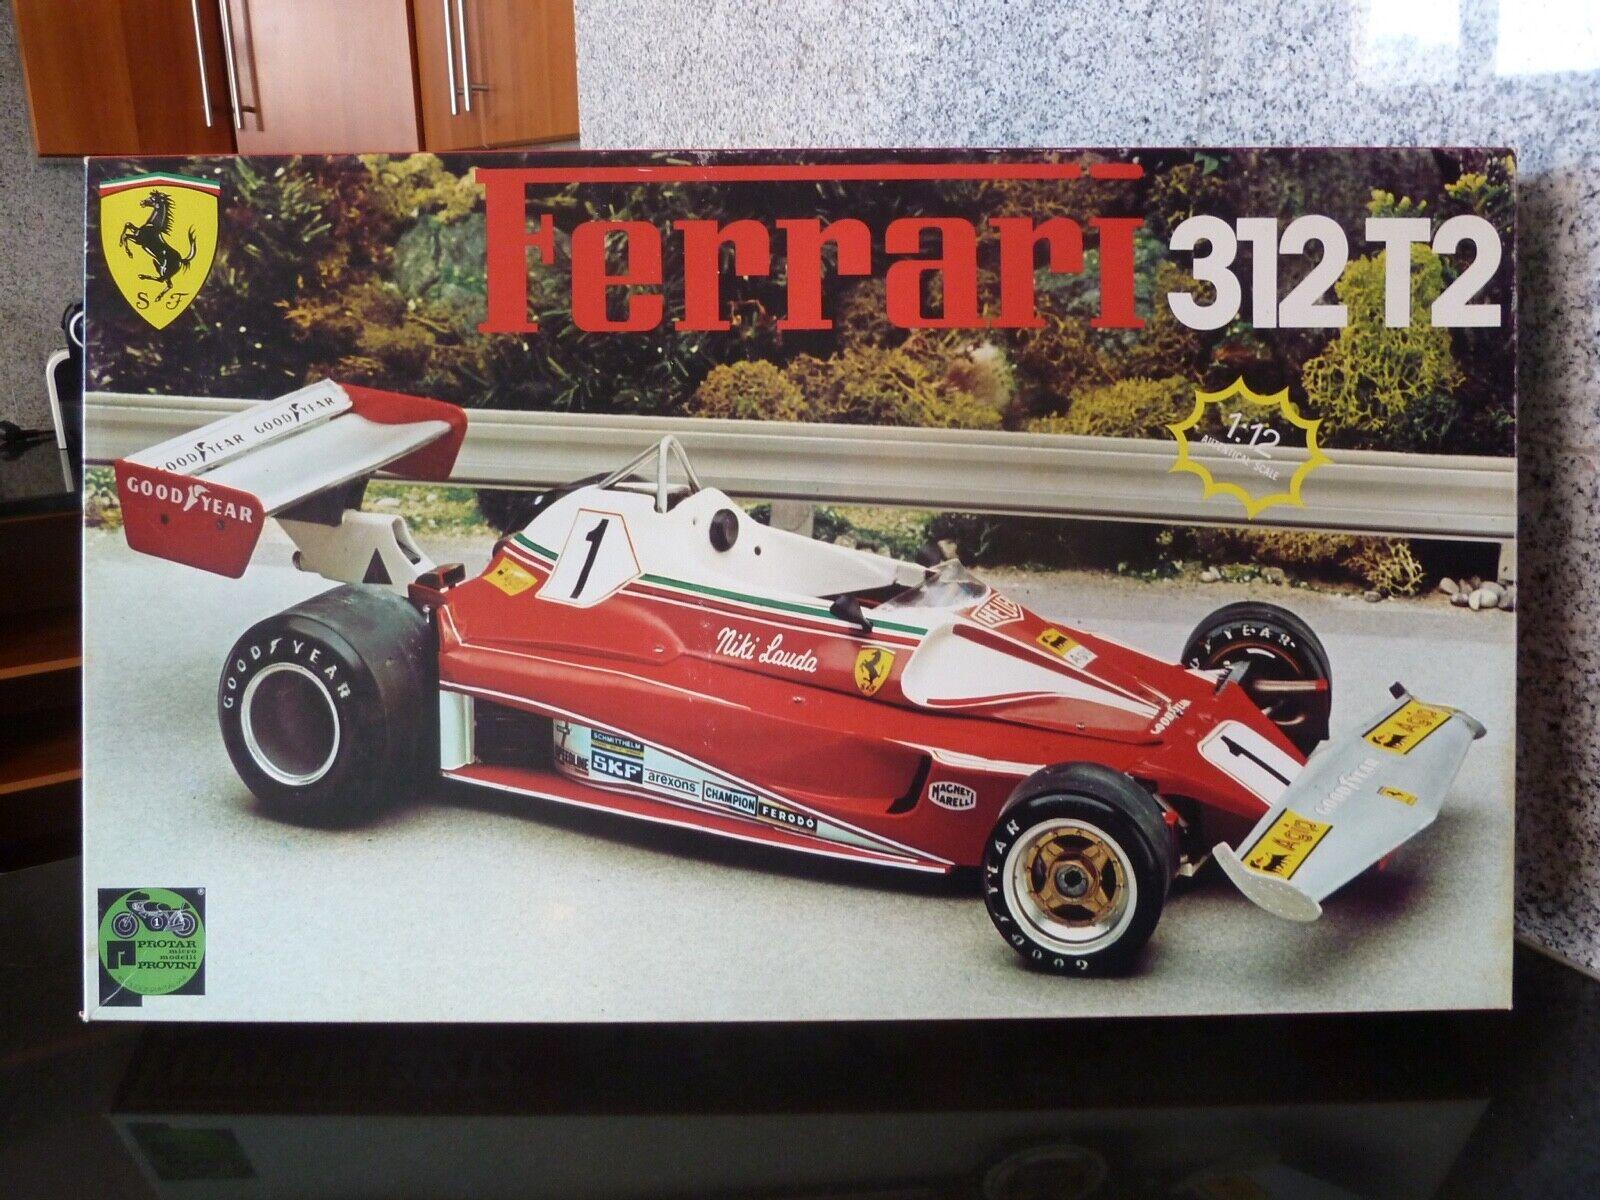 1 12 Predar, Ferrari 312 T2 (not Tamiya)